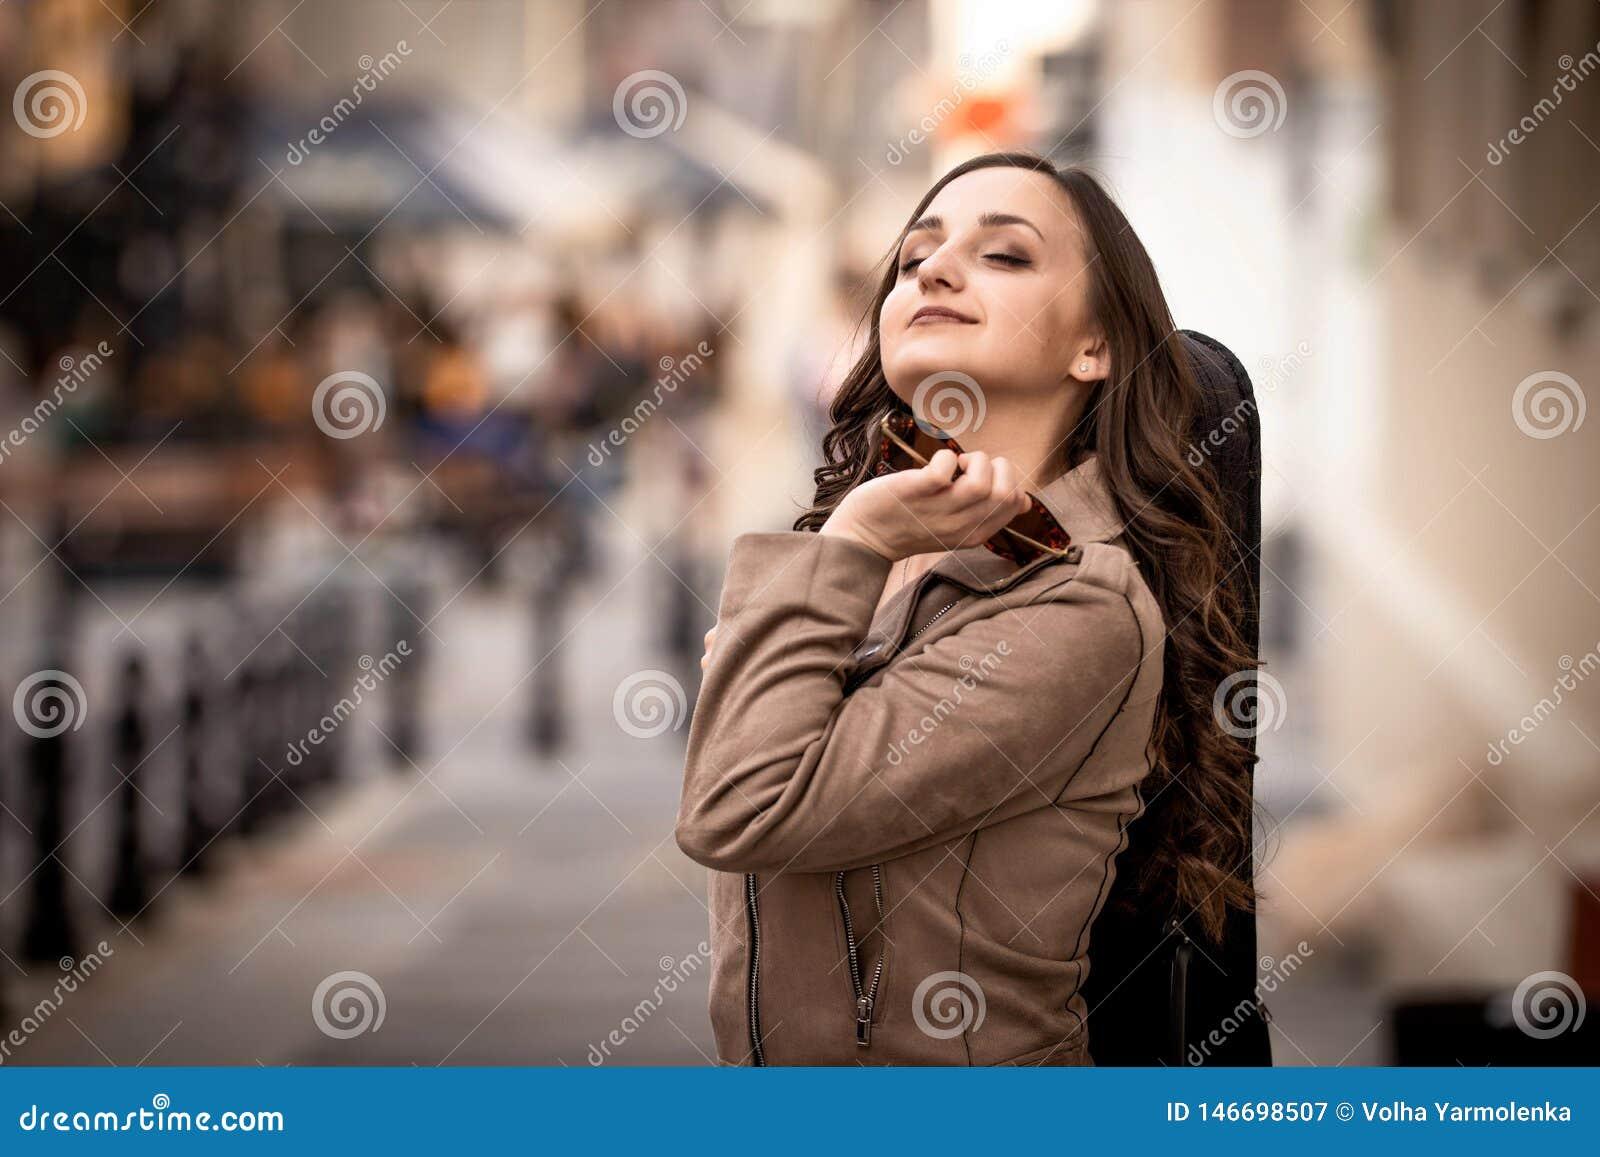 Young woman with a violin case dreams